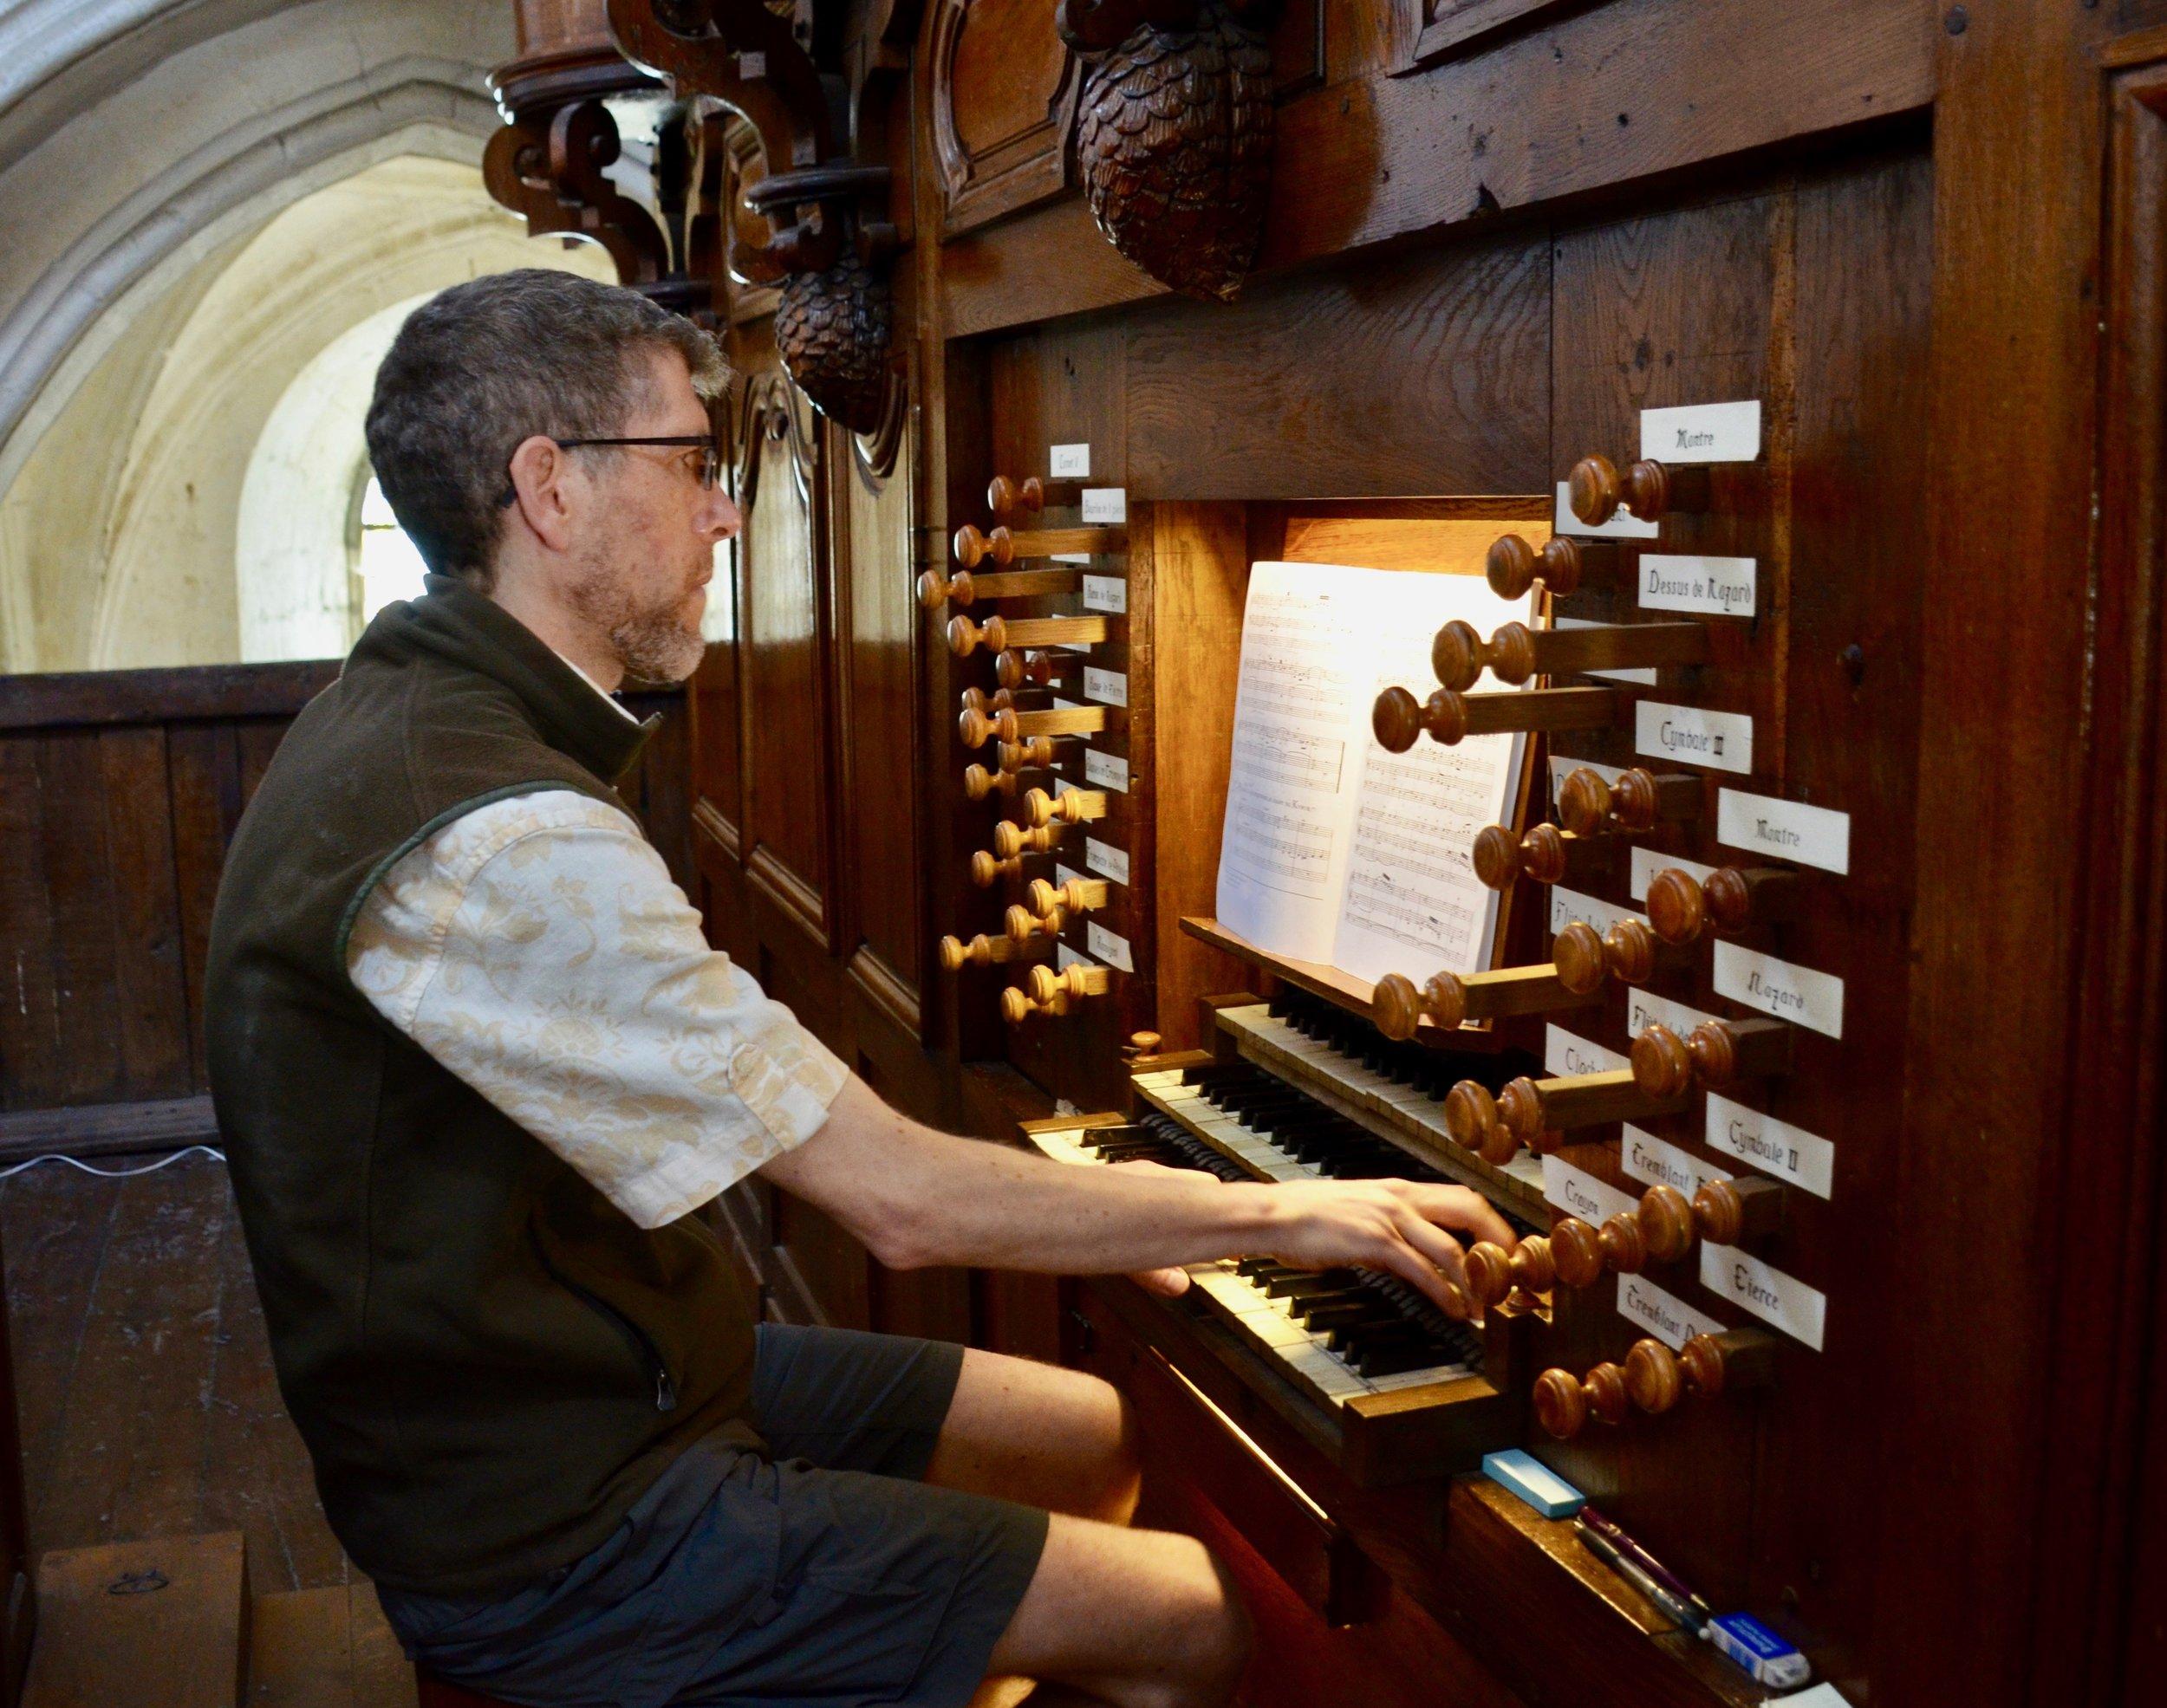 Chris Porter playing the organ at Rozay-en-Brie!